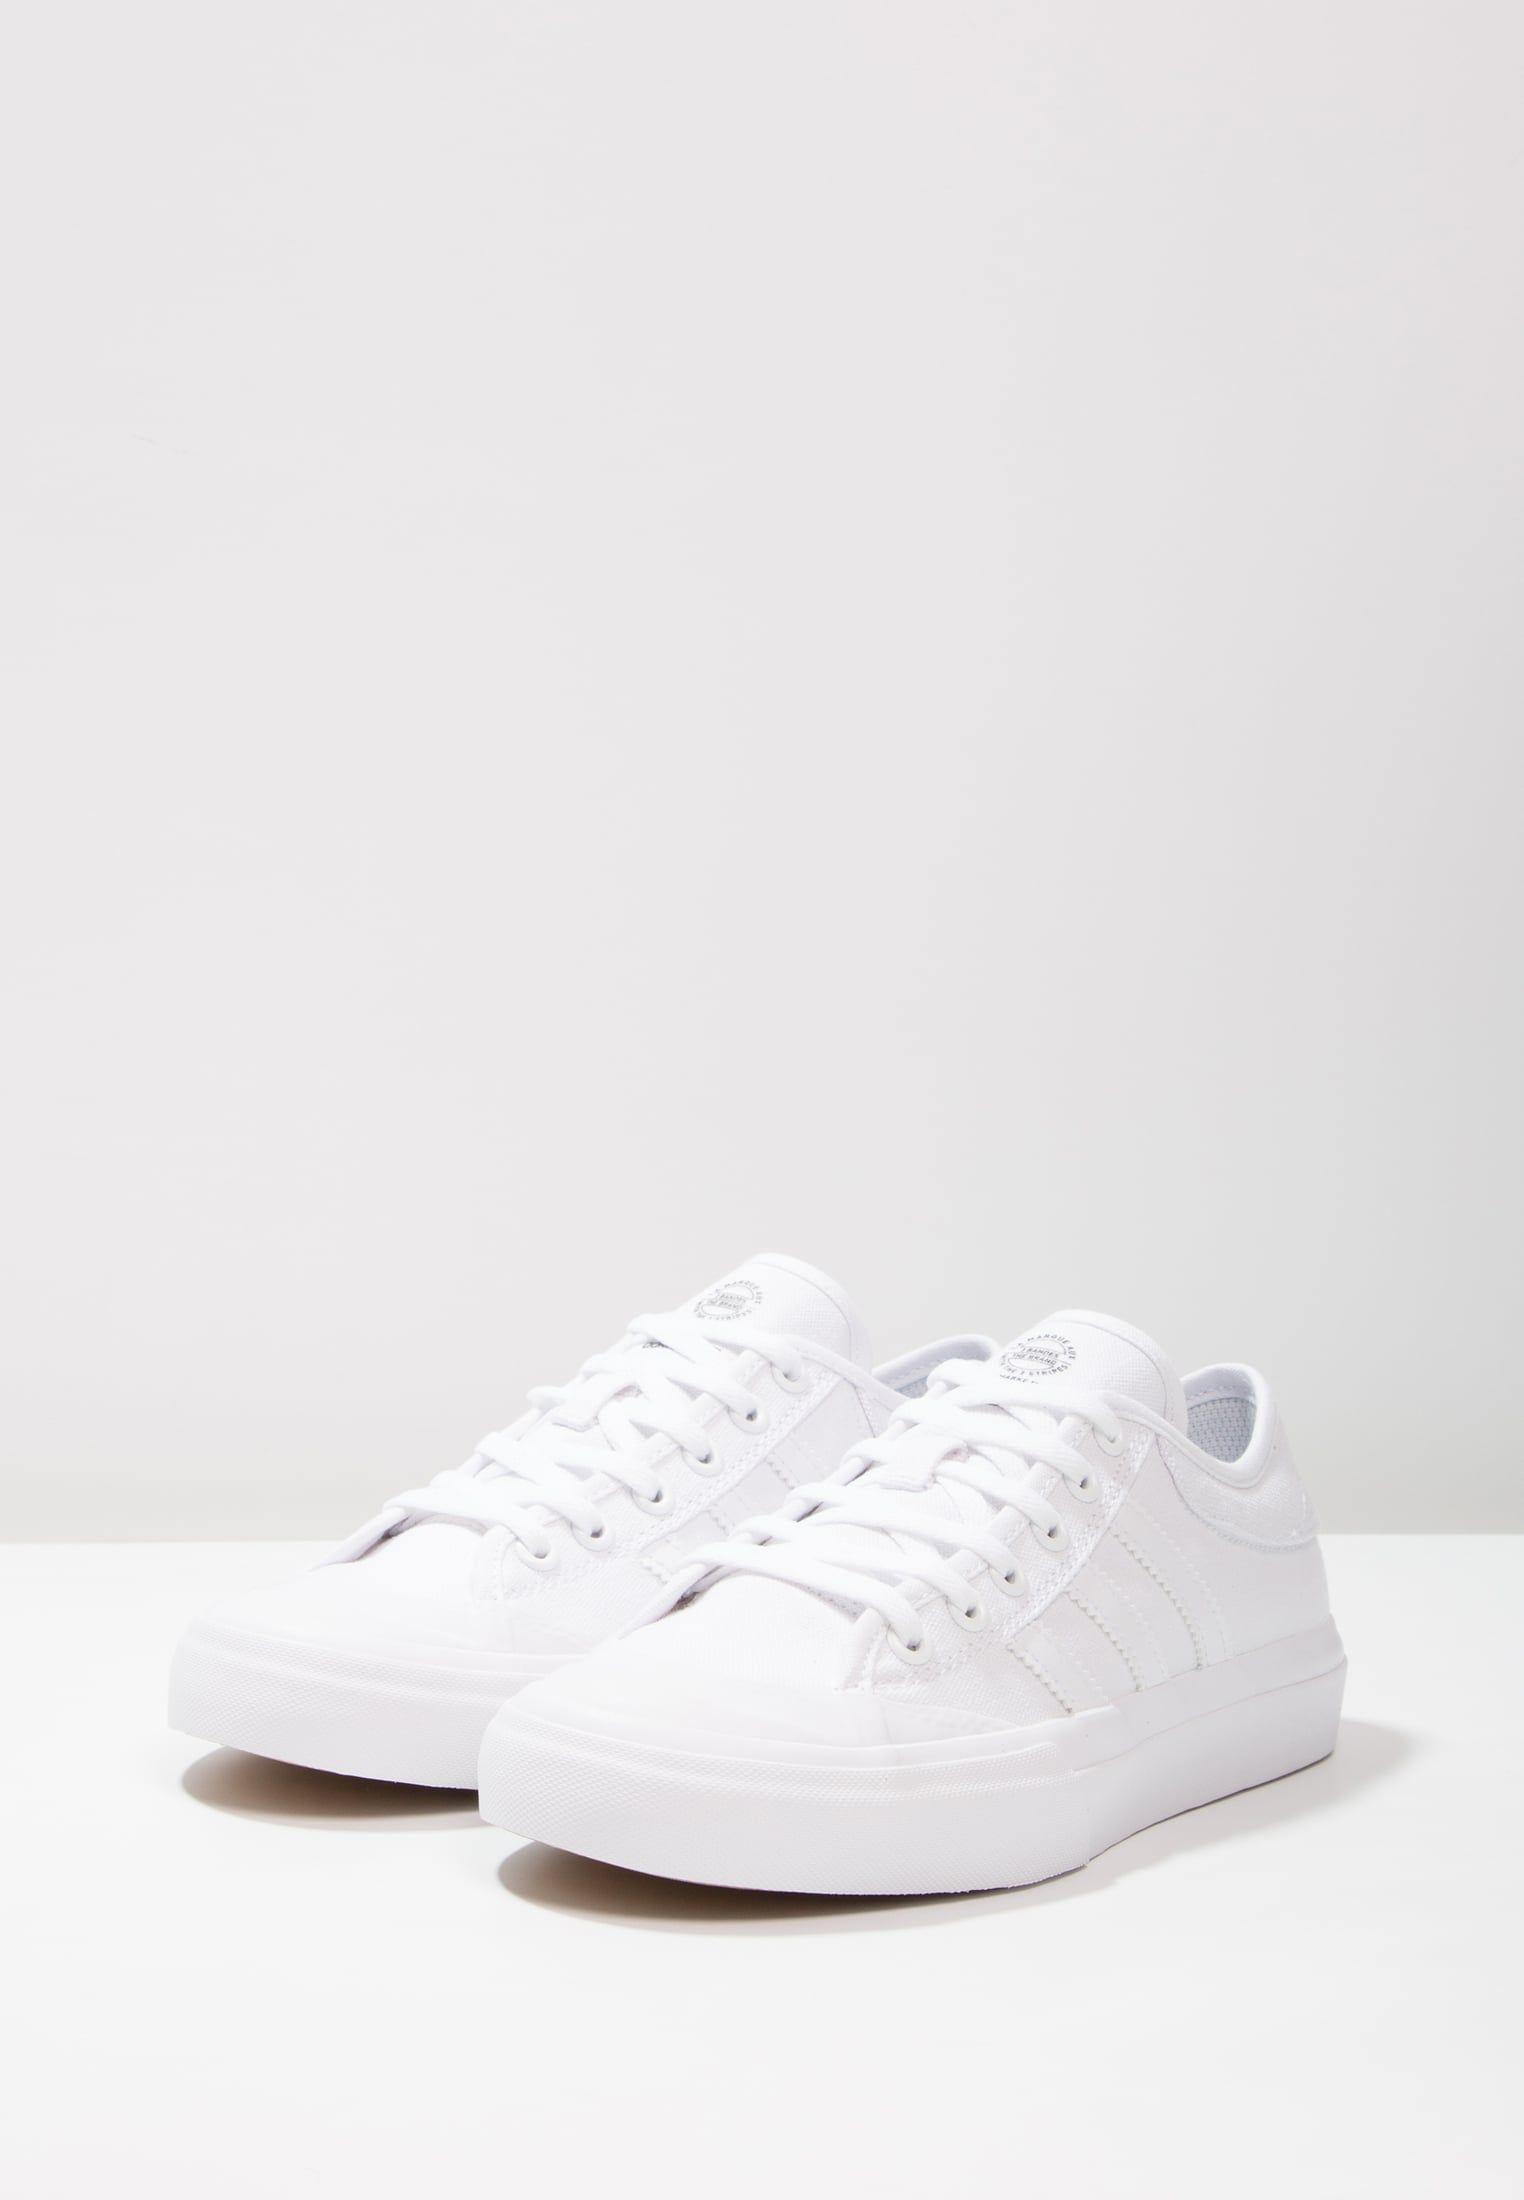 compañero Parecer Ídolo  adidas Originals MATCHCOURT - Sneakers - footwear white - Zalando.dk